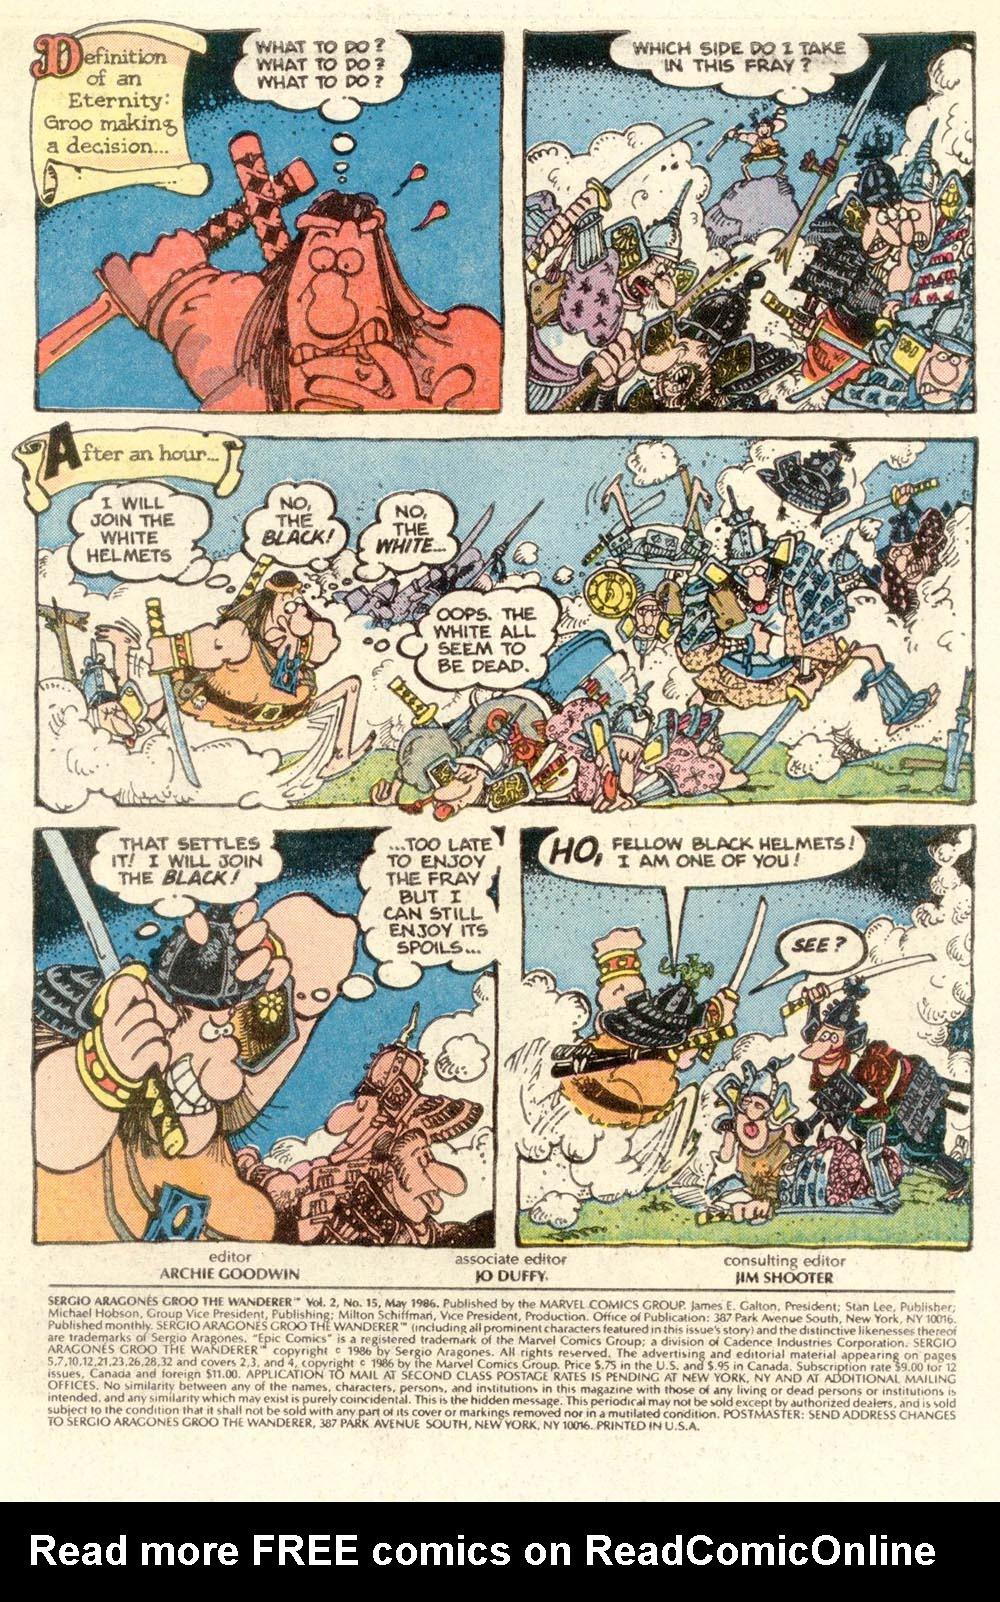 Read online Sergio Aragonés Groo the Wanderer comic -  Issue #15 - 2